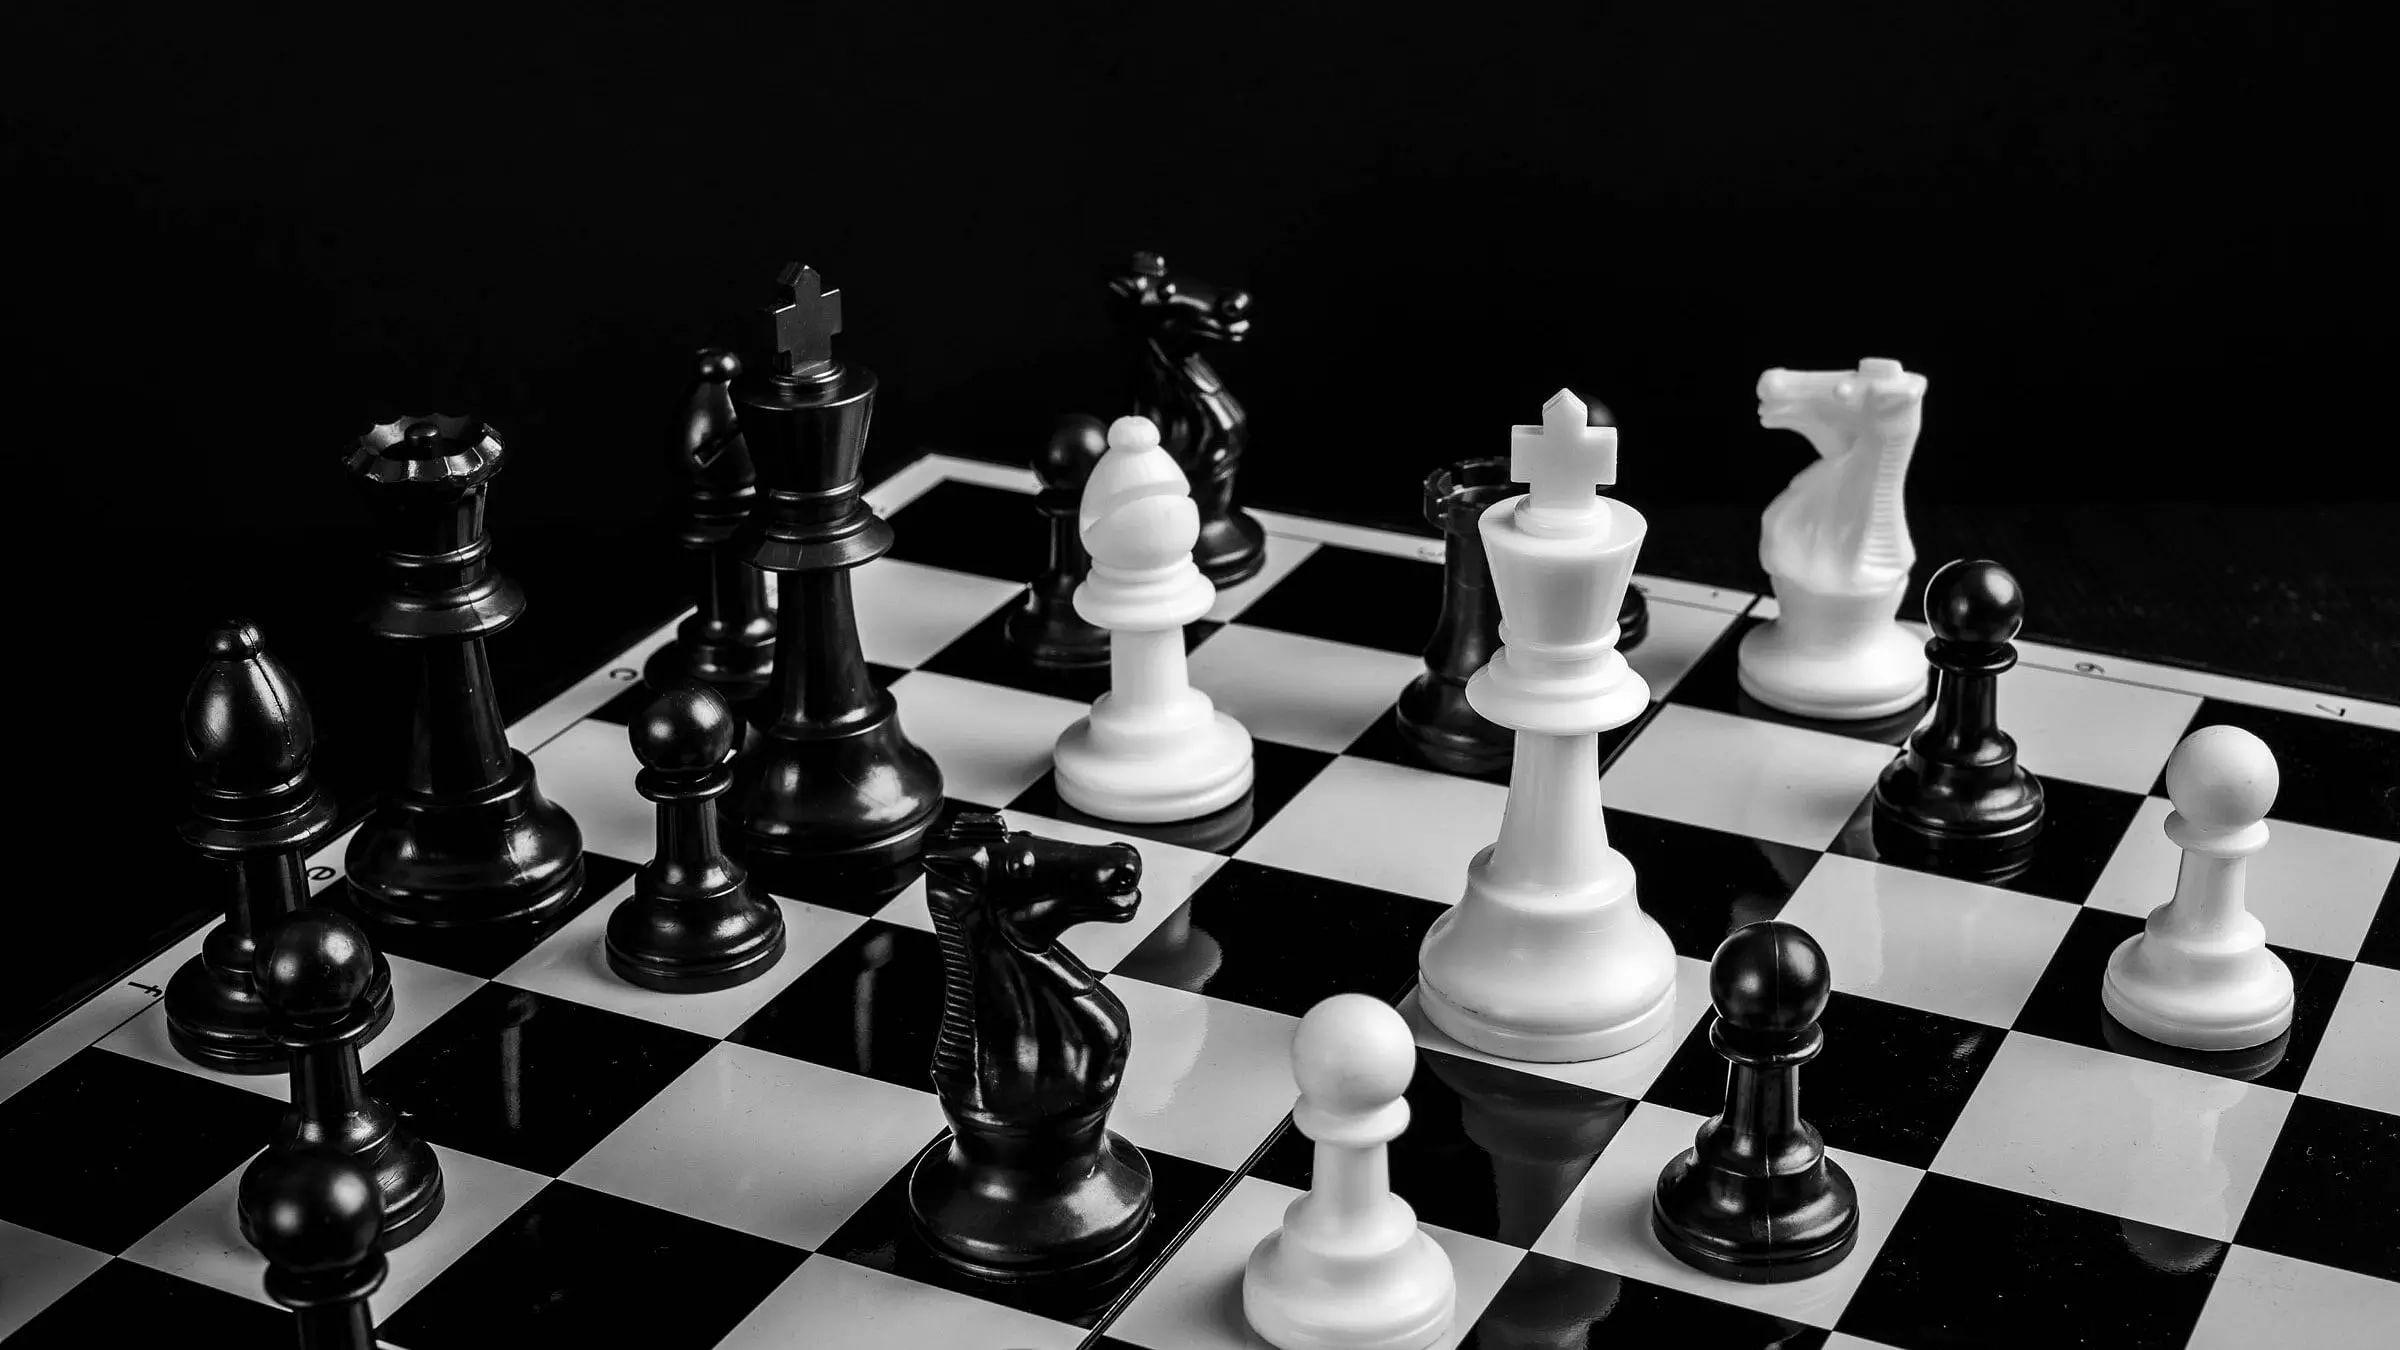 Assam Chess Club will organize 4th Guwahati India Open from Dec 25